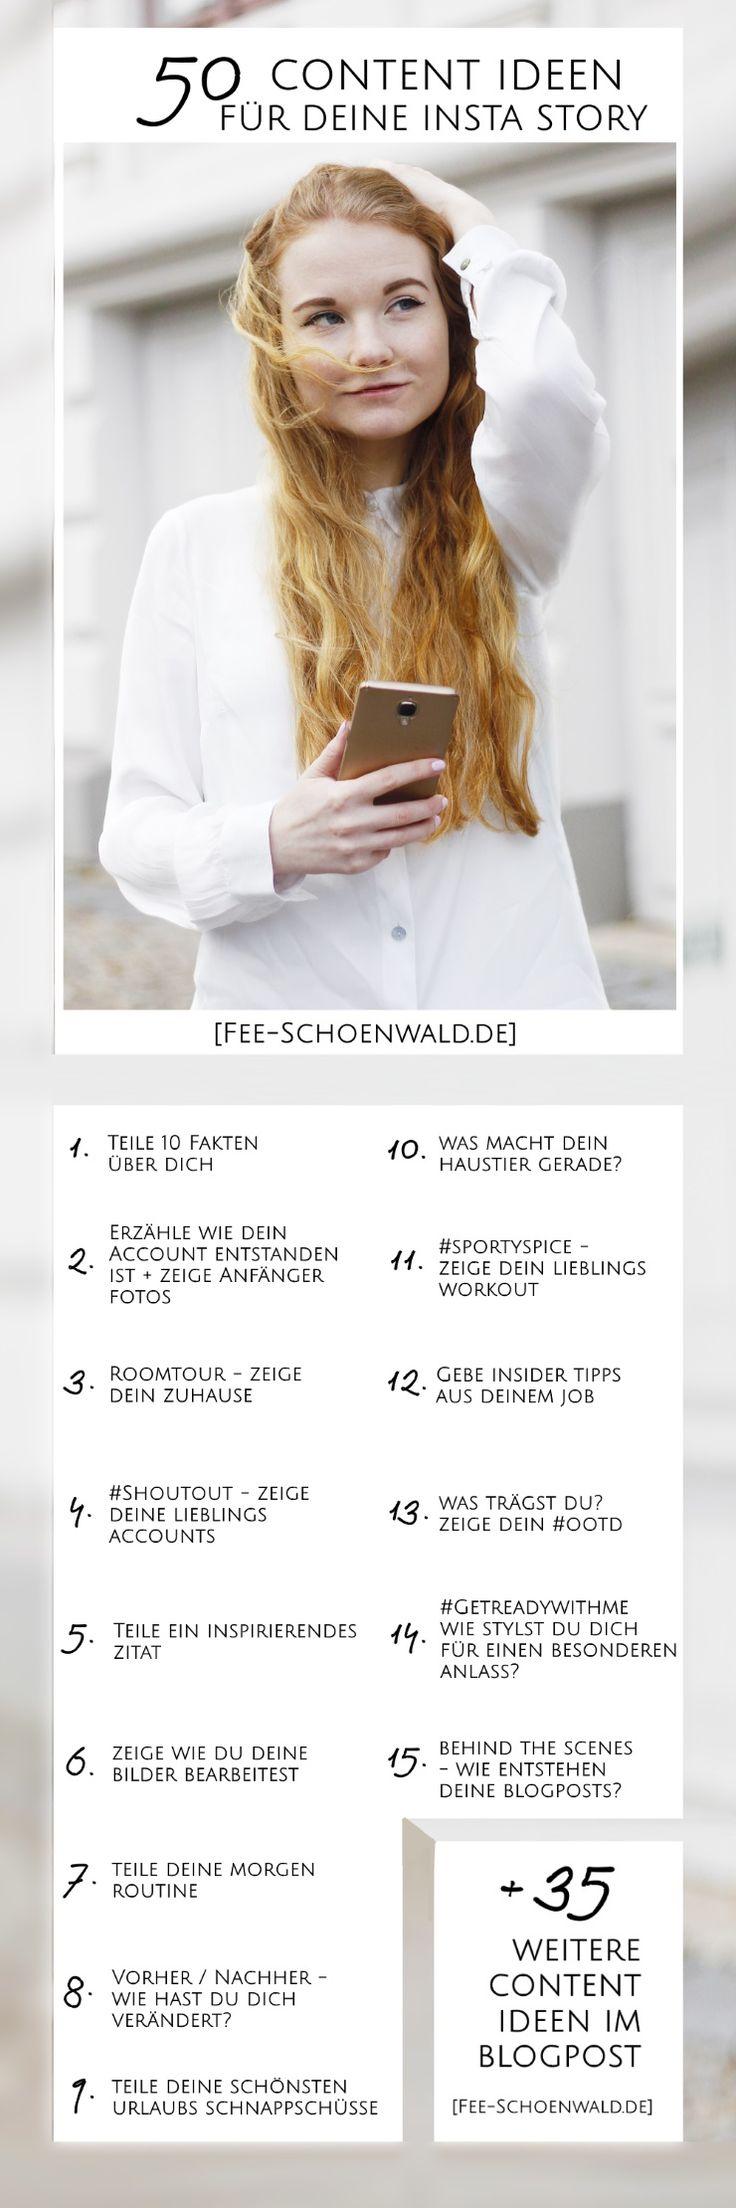 Fee Schoenwald Blogger Tipps 50 Content Ideen Instagram Story